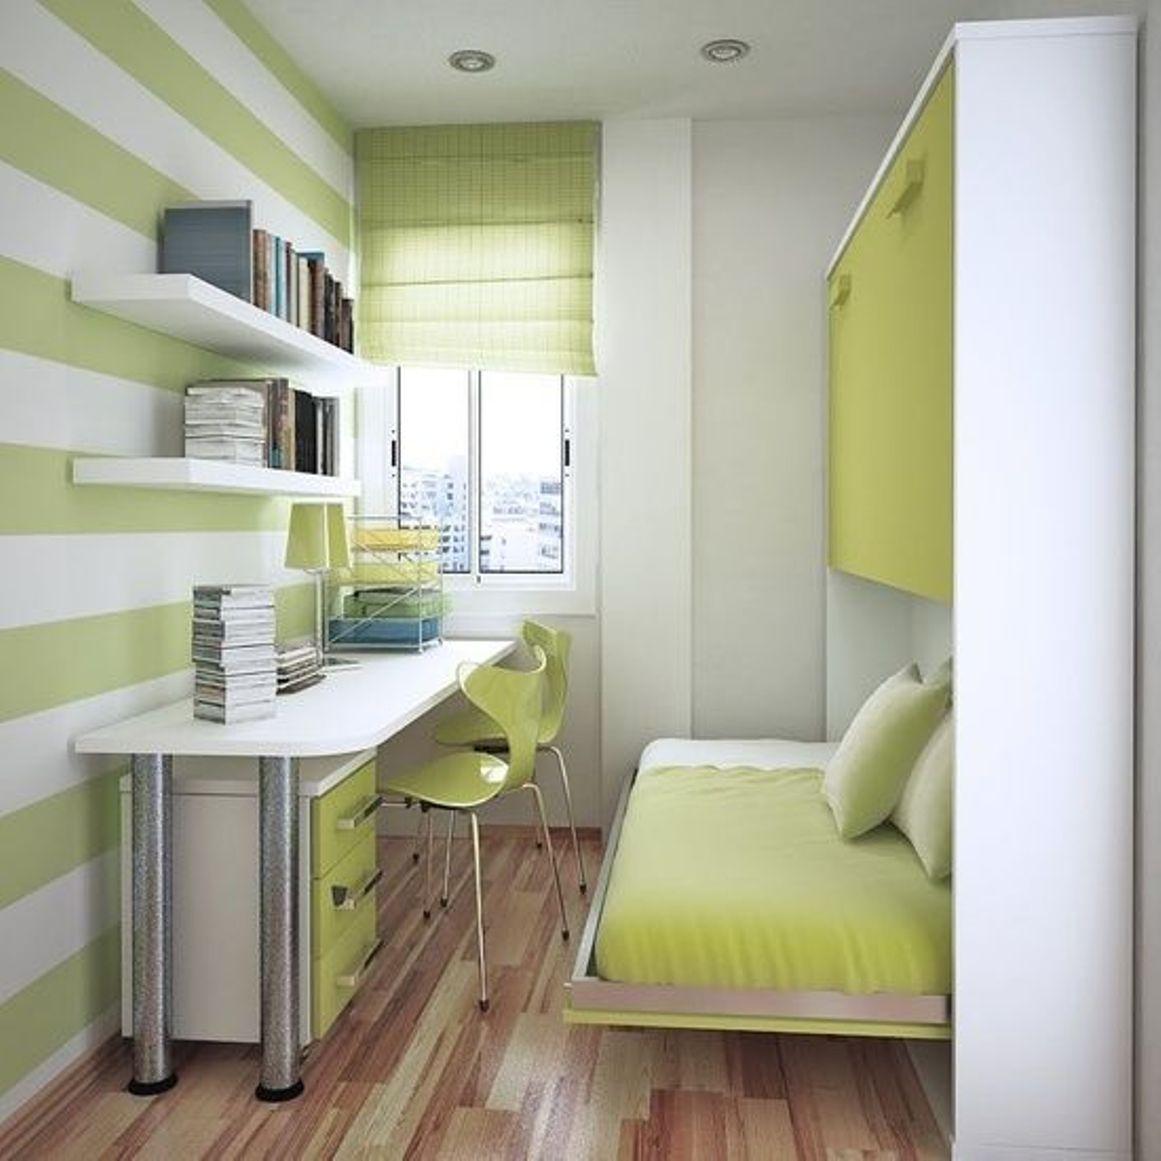 One Accent Wall With Light Green And White Cream Stripes Como Decorar Habitaciones Pequenas Decorar Habitacion Pequena Habitaciones Infantiles Pequenas